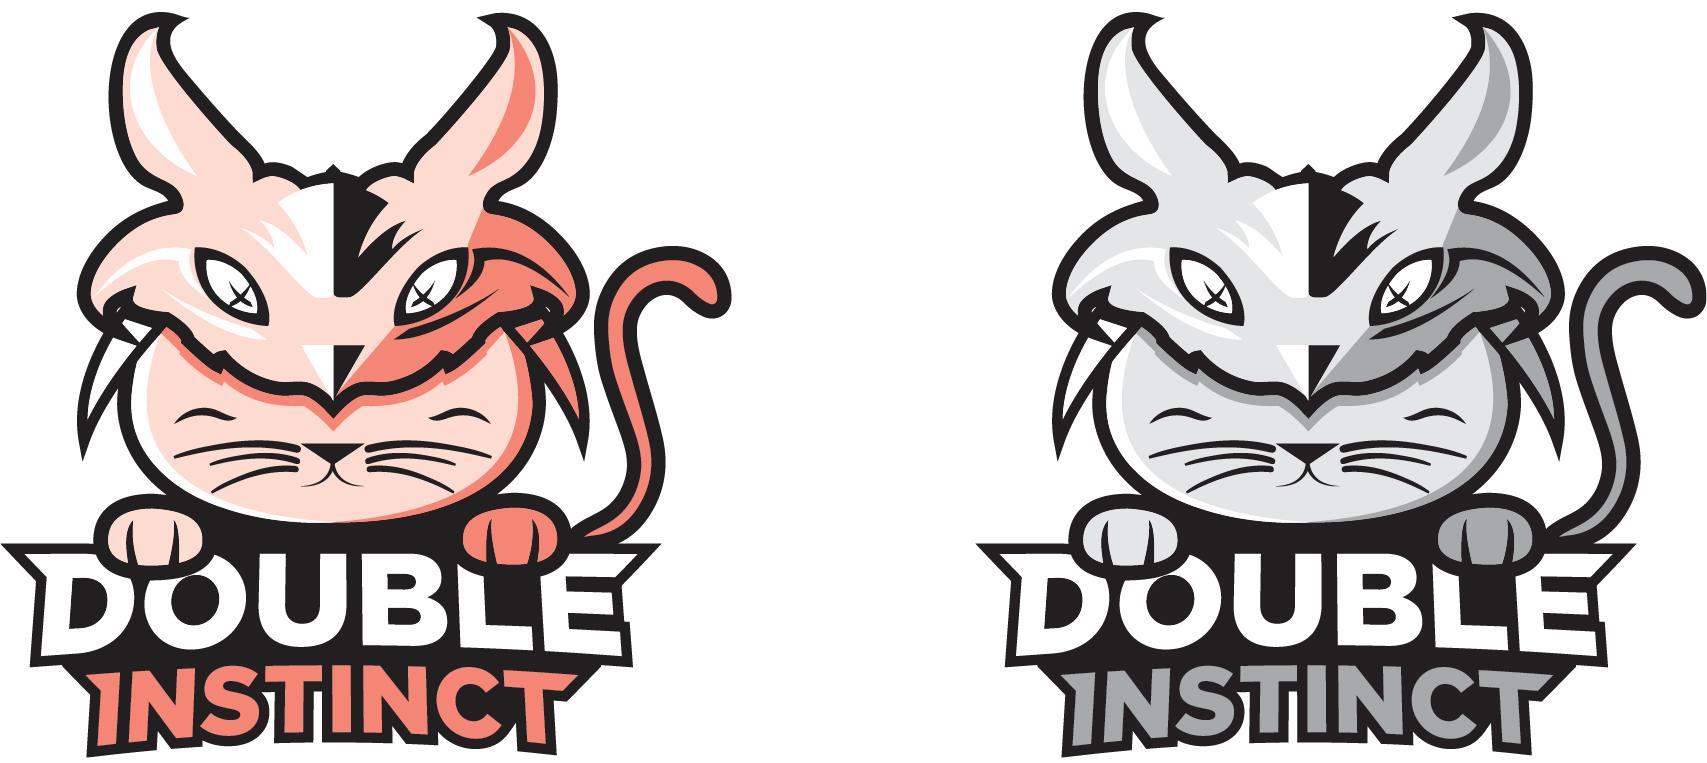 Double Instinct color&bw-01.jpg